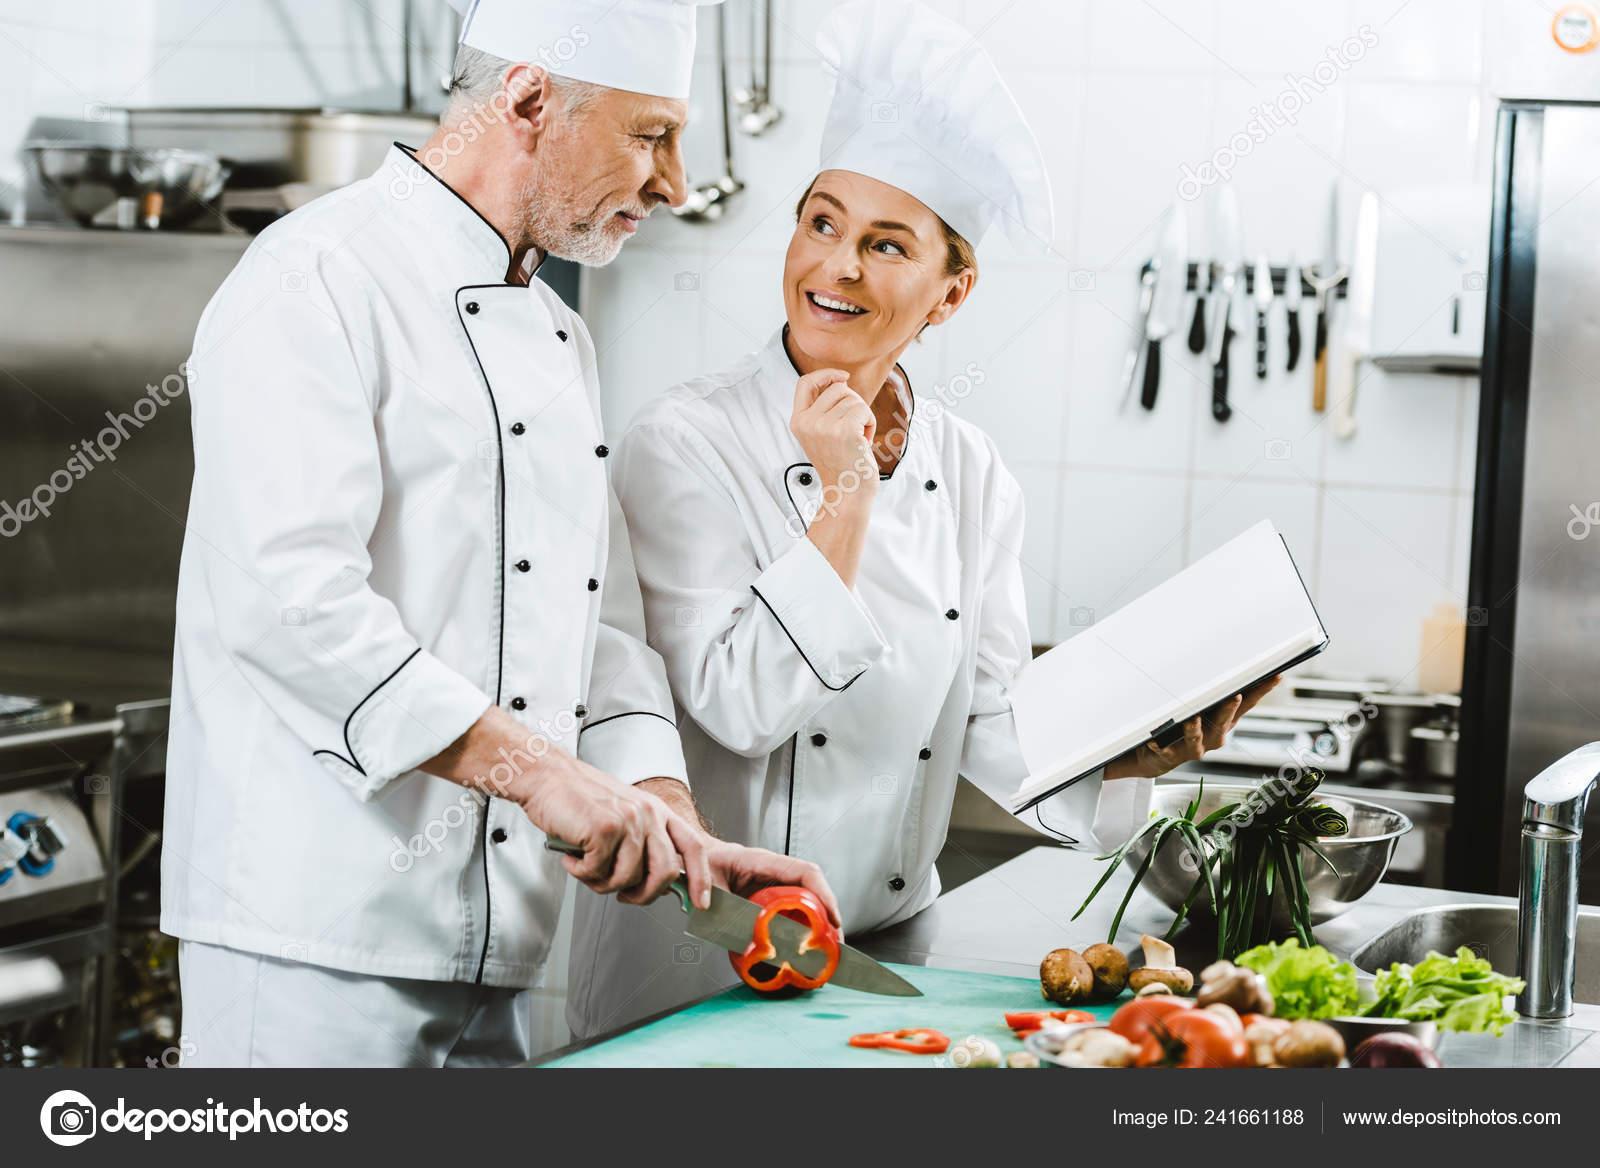 Female Male Chefs Uniform Using Recipe Book Cooking Restaurant